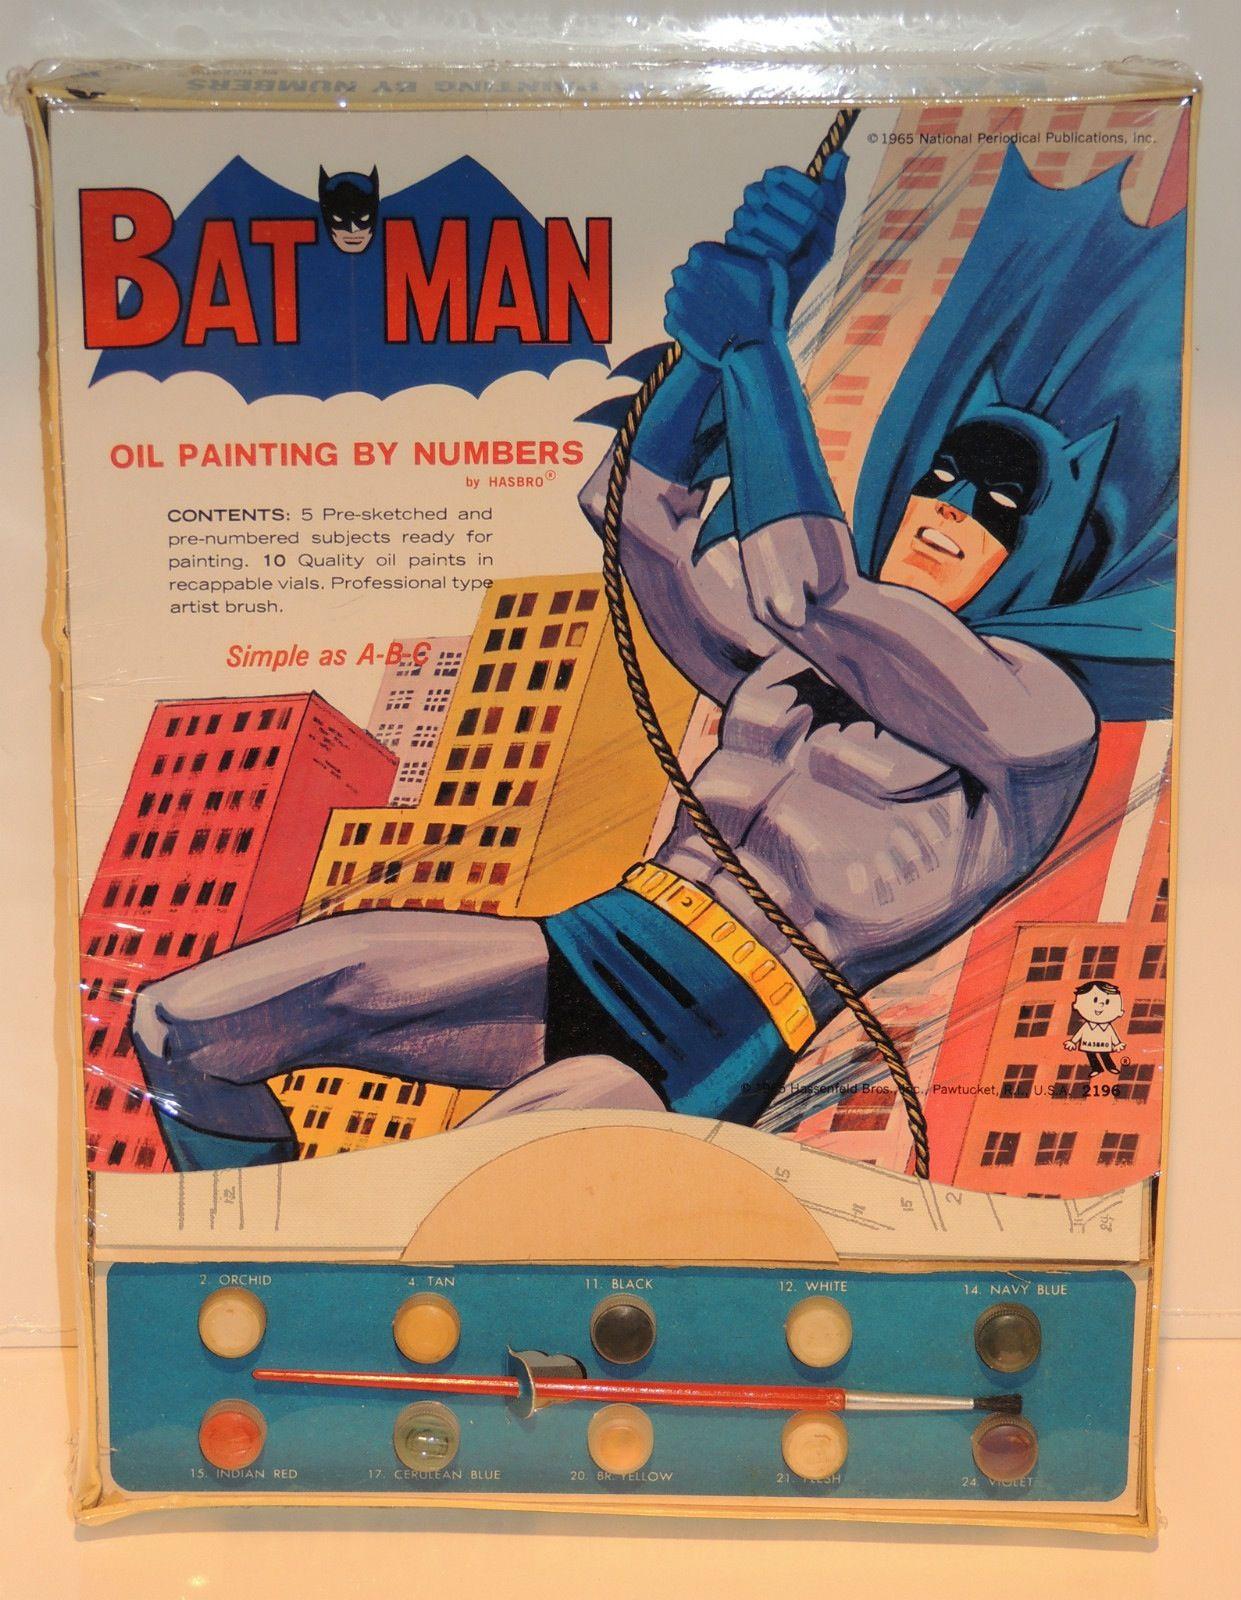 vintage batman posters | : Vintage Batman Movie Poster , Vintage Spiderman Poster , Vintage ...